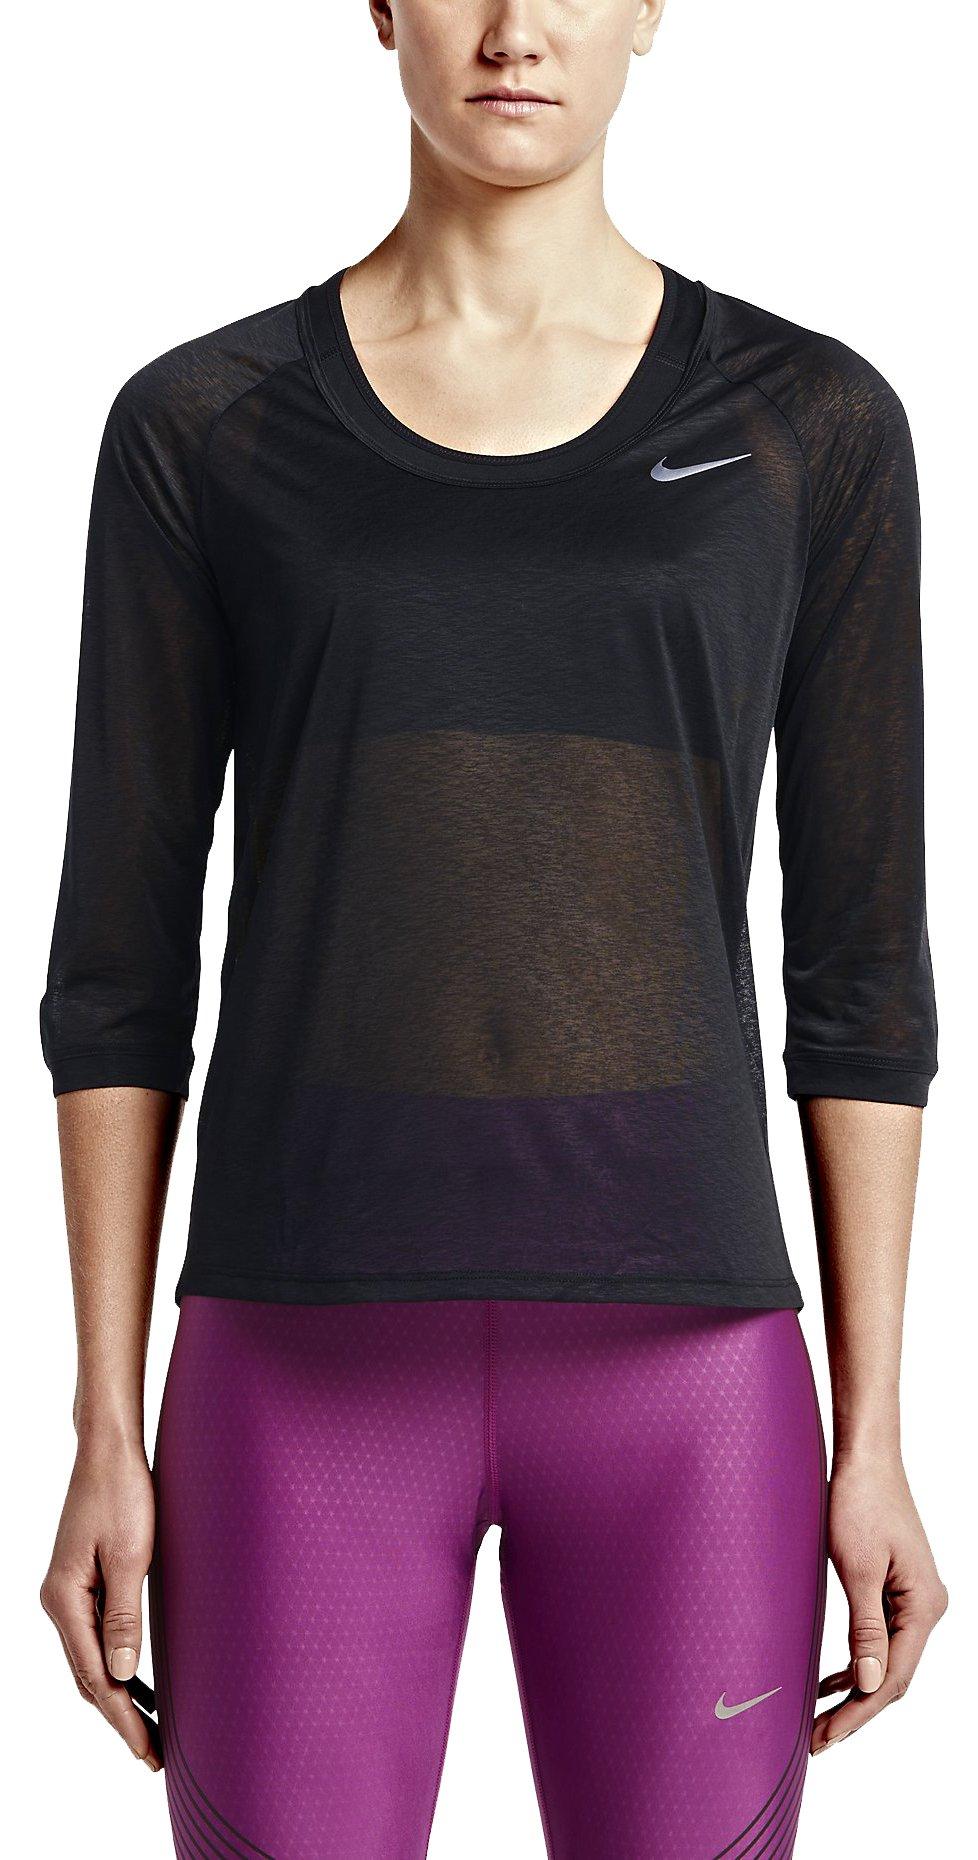 Triko s dlouhým rukávem Nike Dri-FIT Cool Breeze 3/4